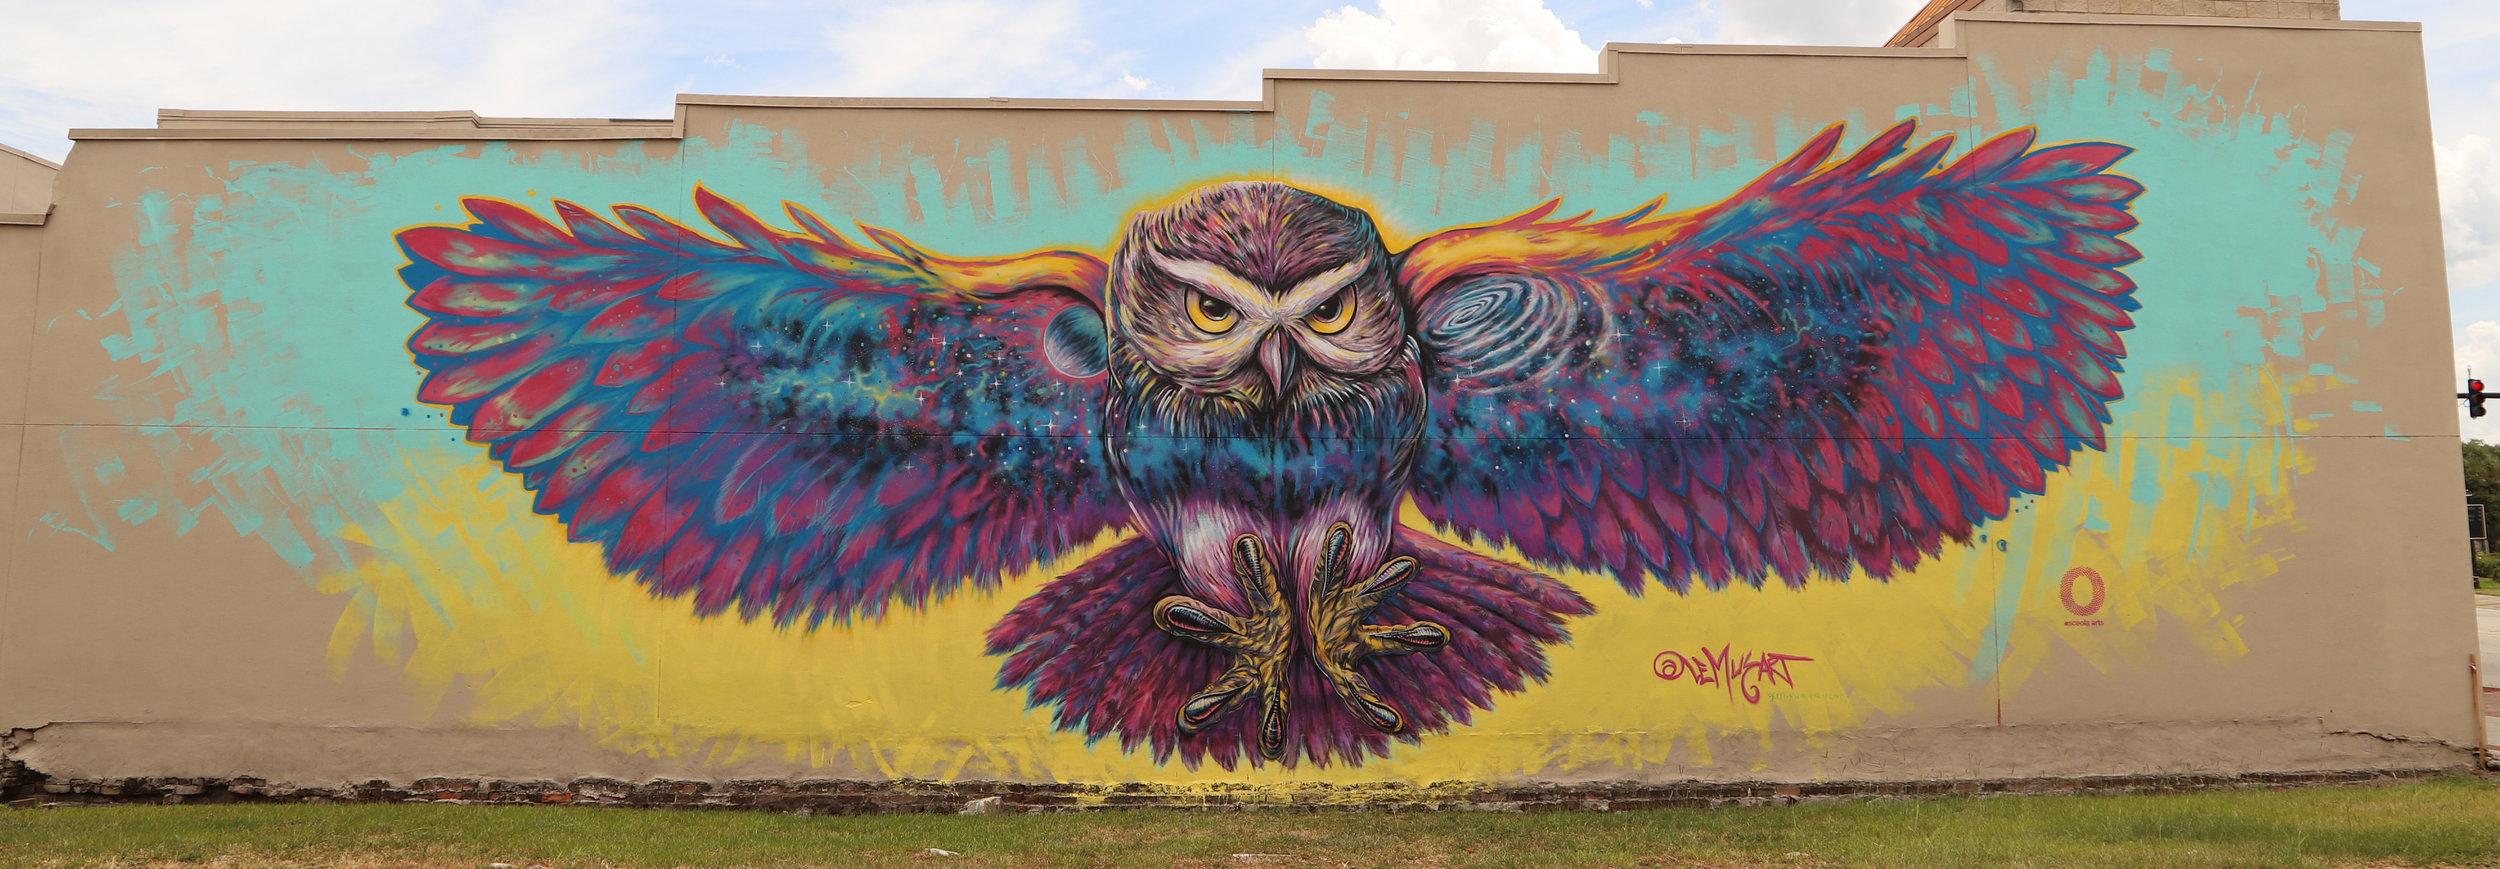 Cosmic Owl - Lemus.jpg